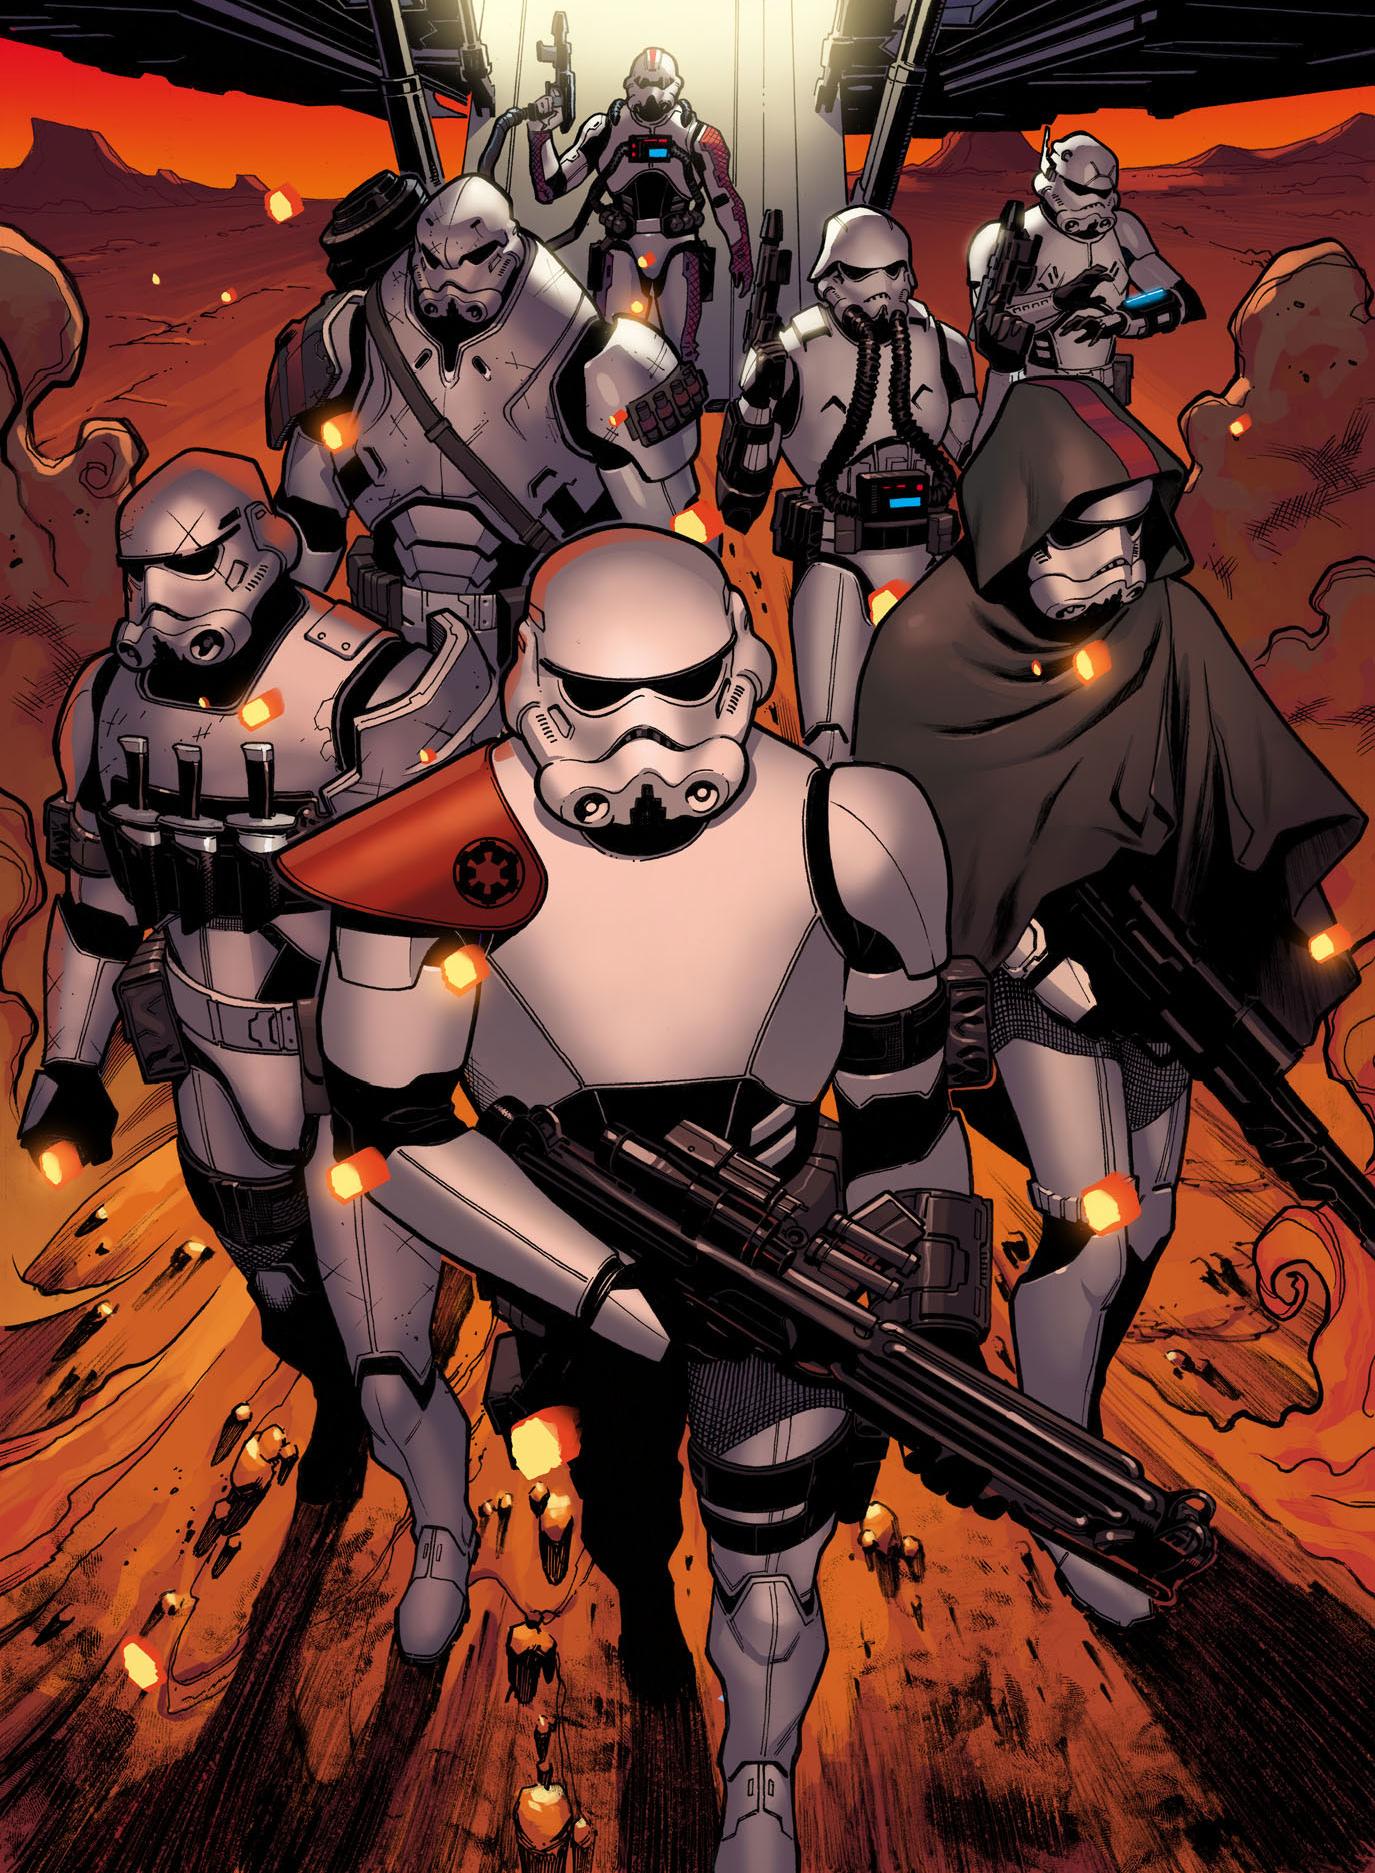 Marvel's Star Wars Title is Gaining Elite Stormtroopers